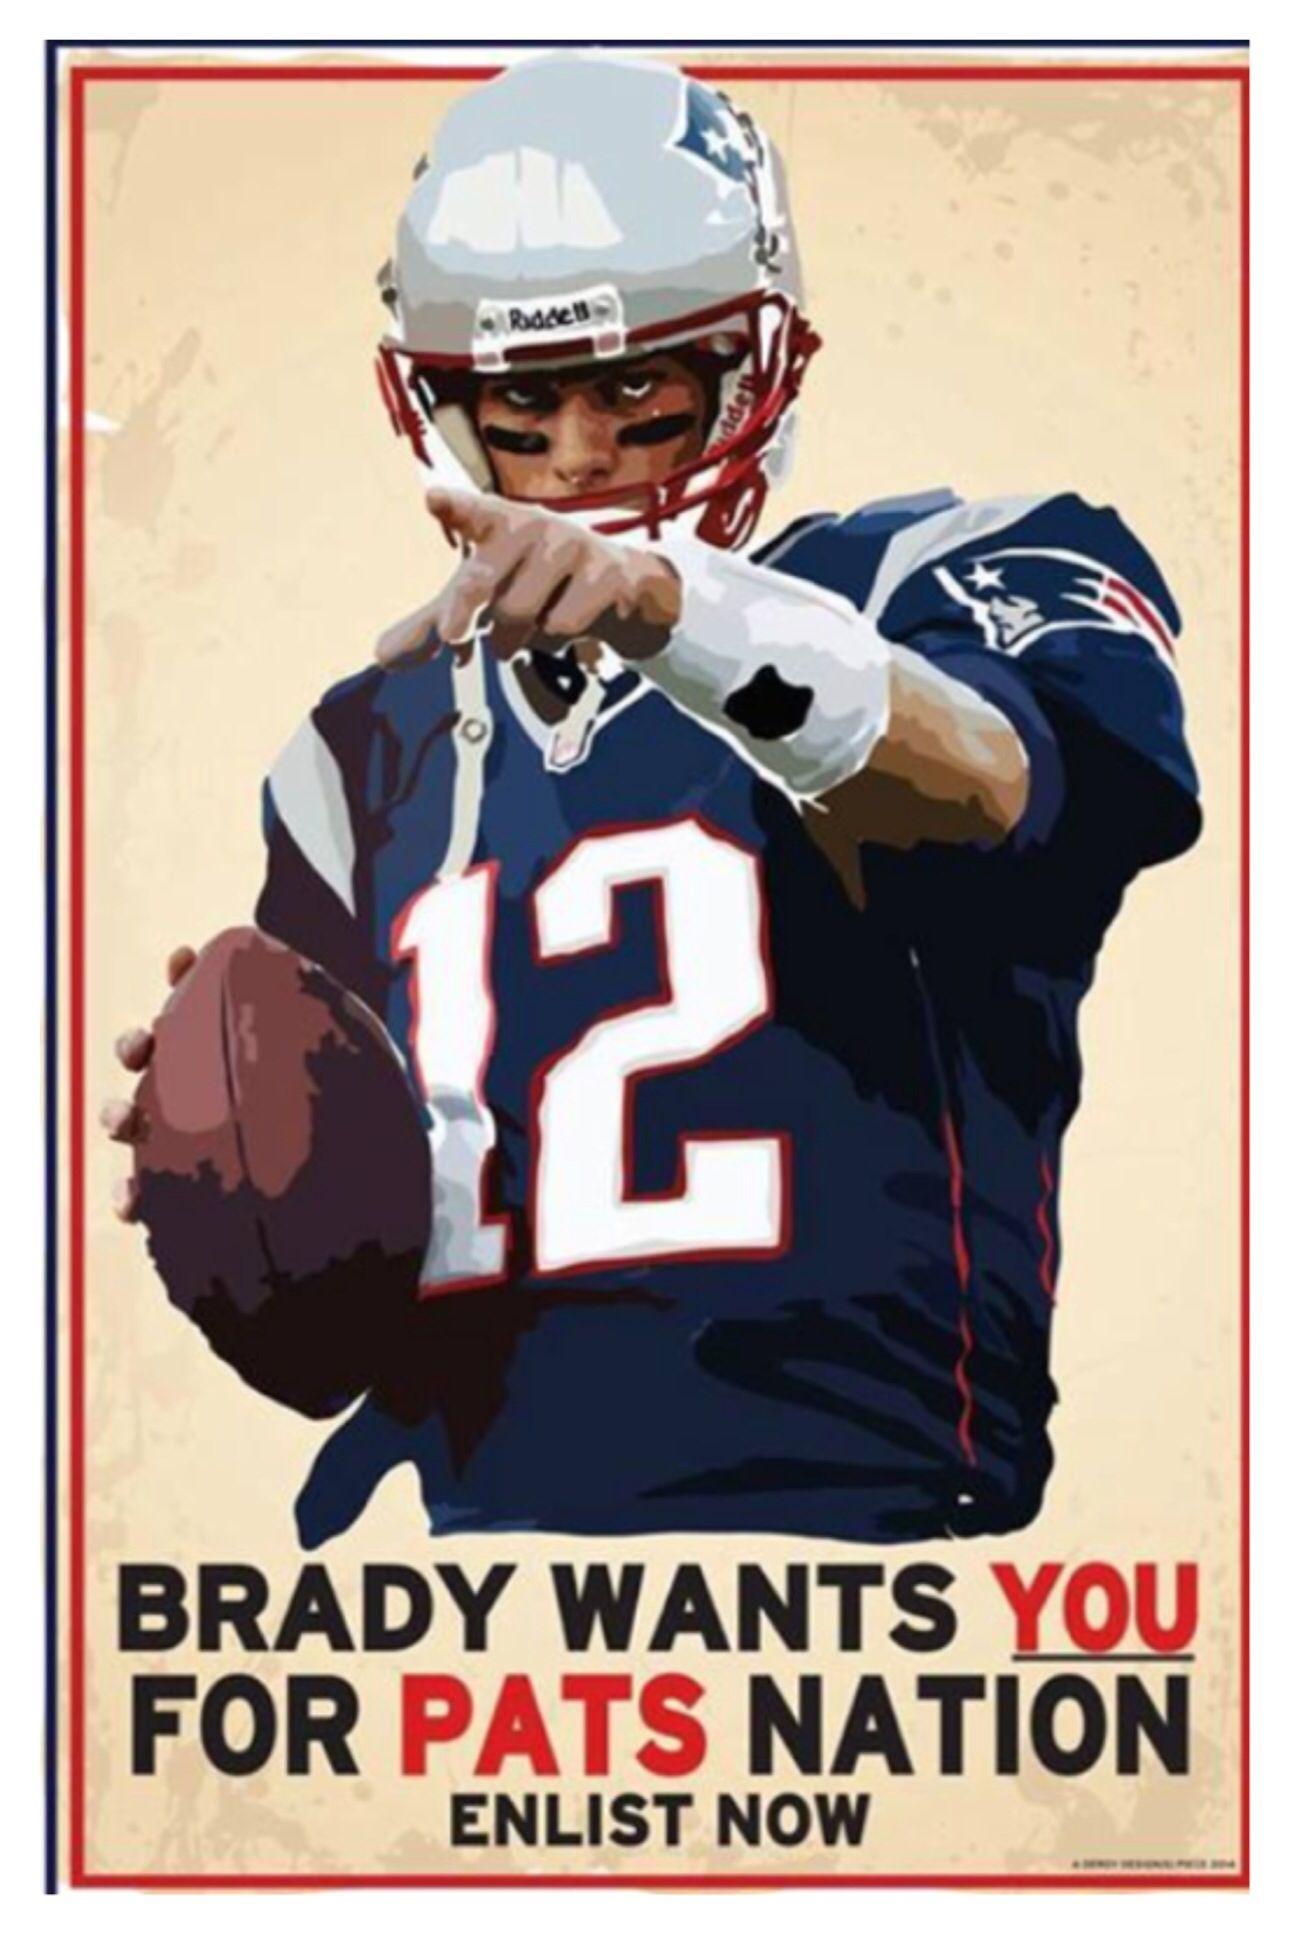 Pats Nation Patriots Football New England Patriots Football New England Patriots